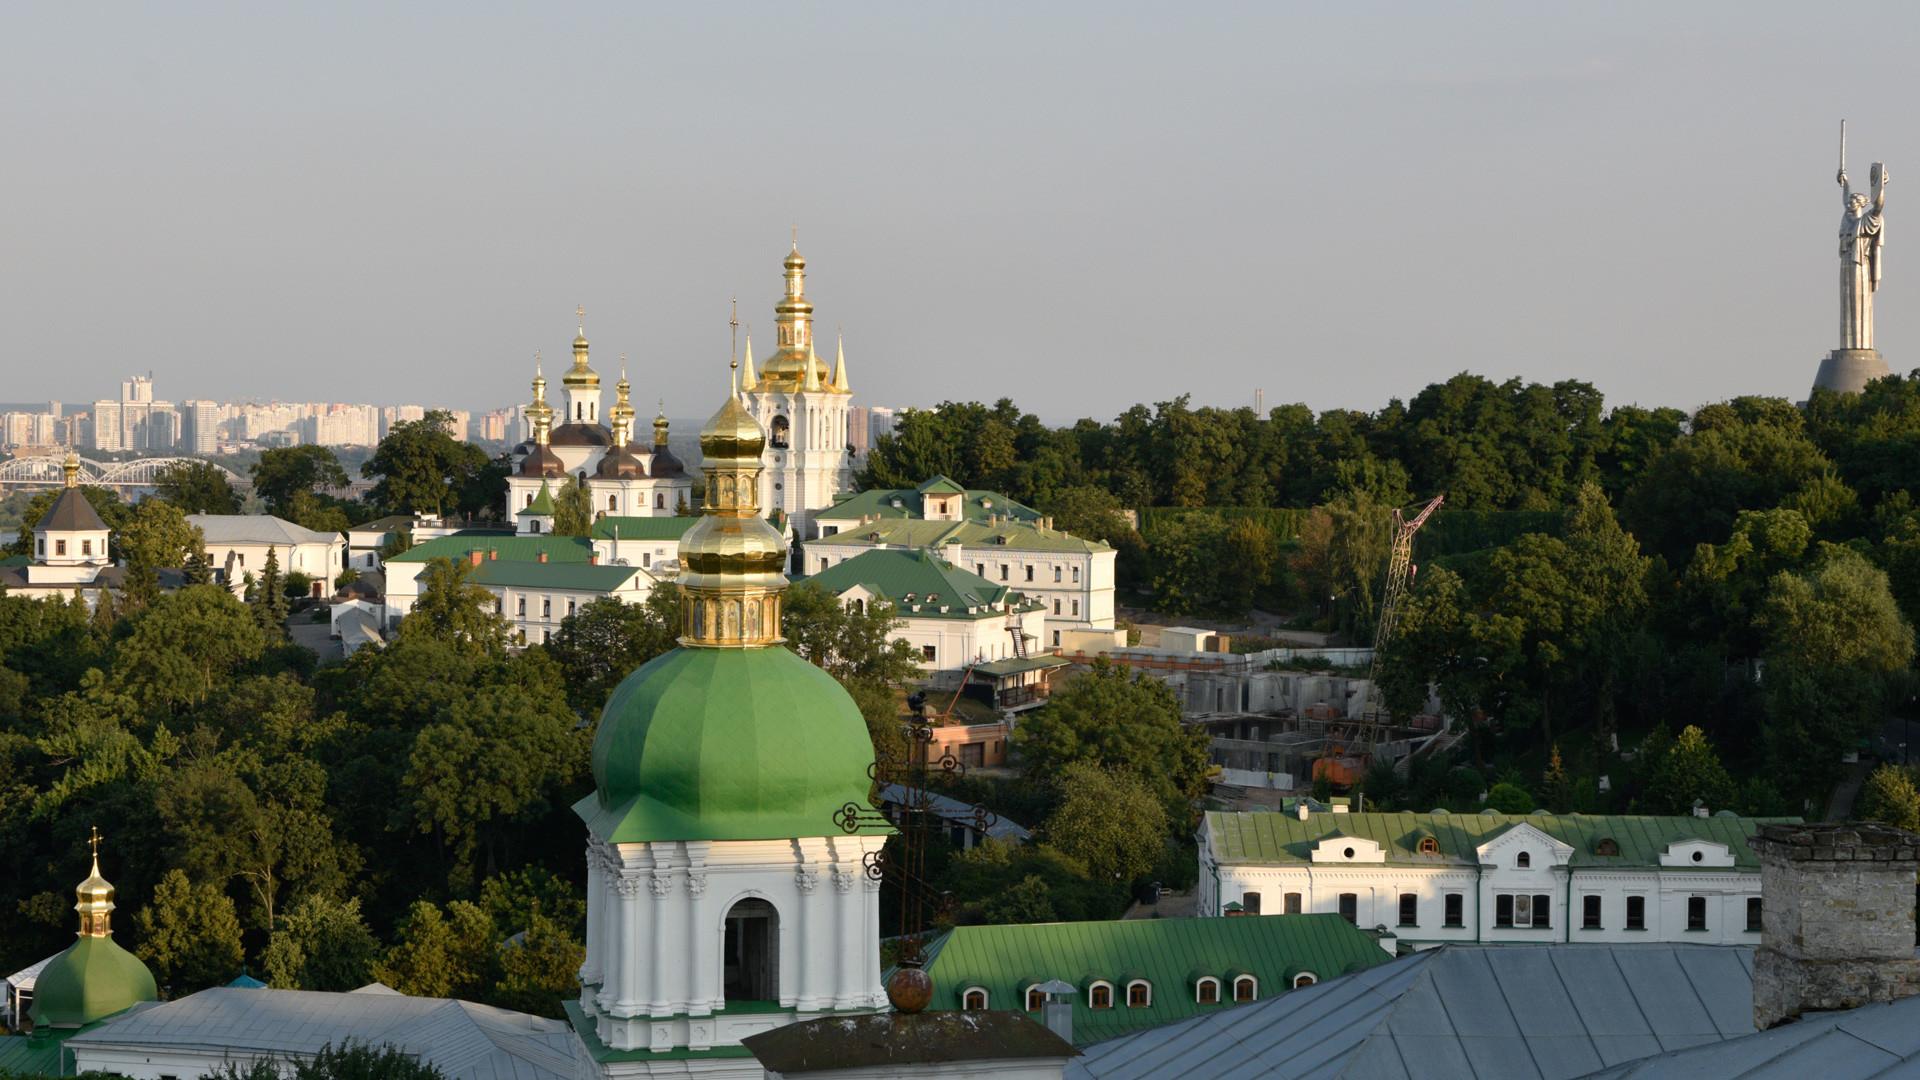 Фото: ©РИА Новости/Стрингер